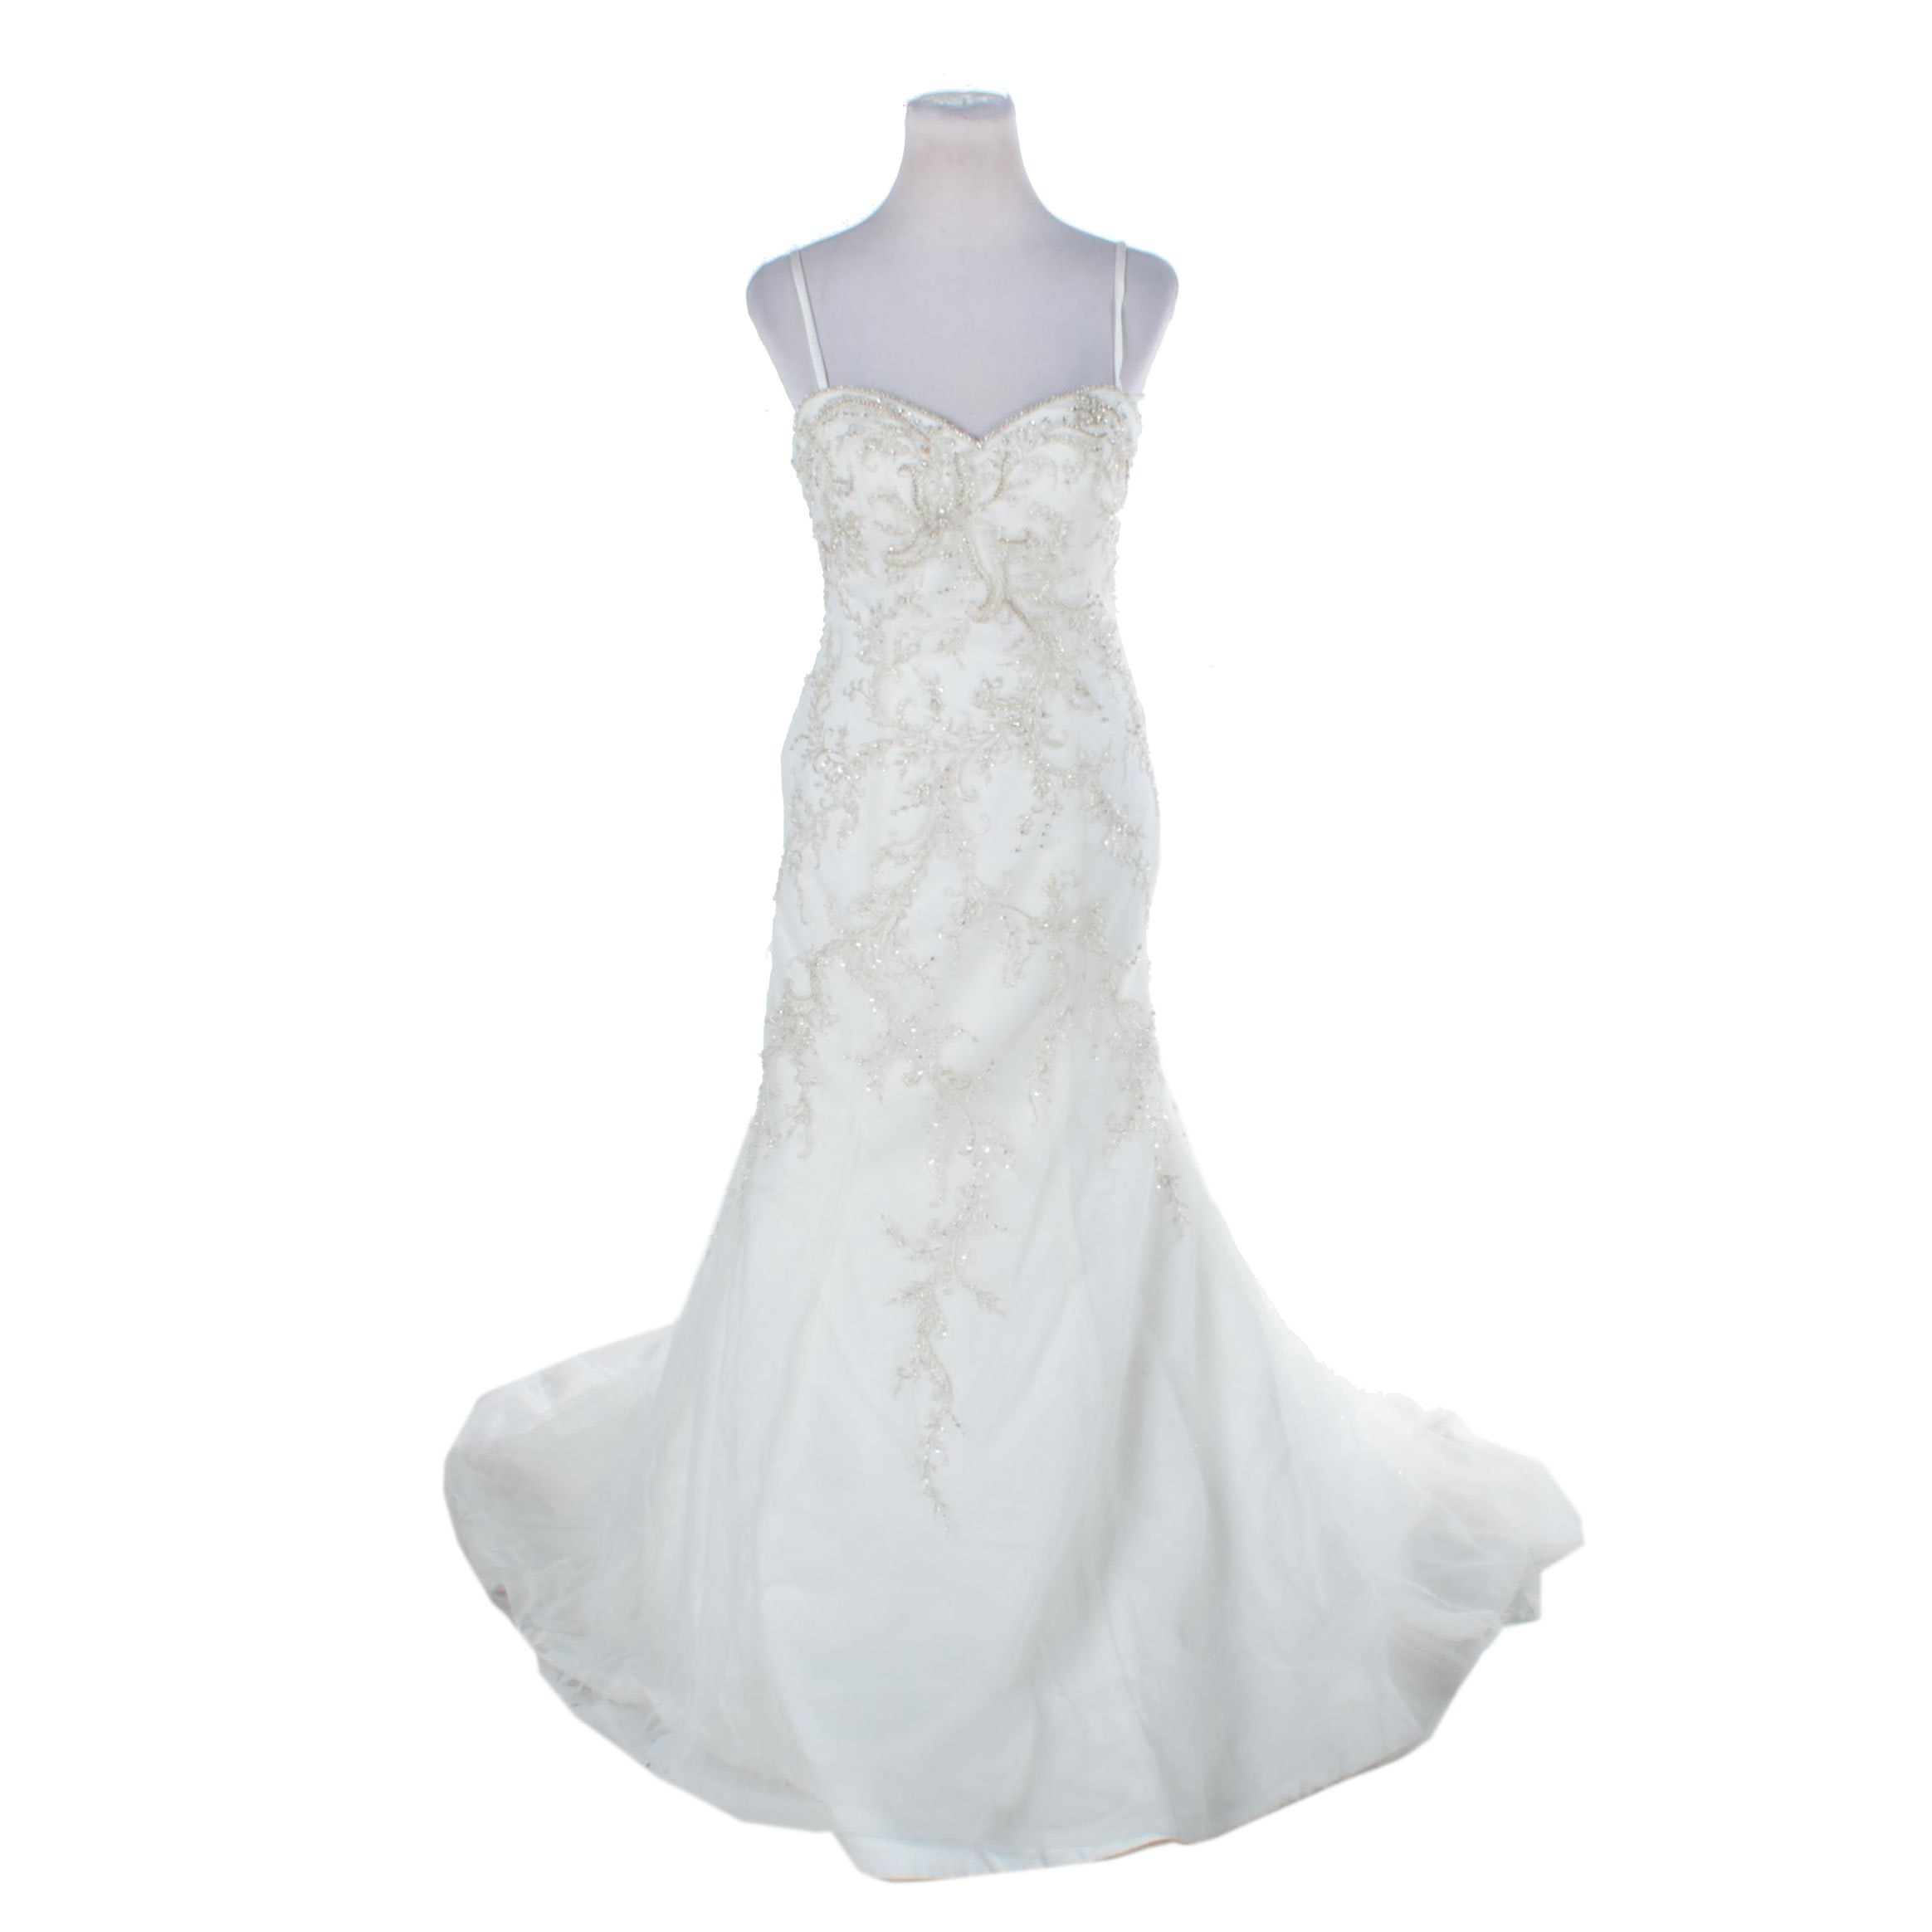 Lovelle by Lazaro Wedding Gown